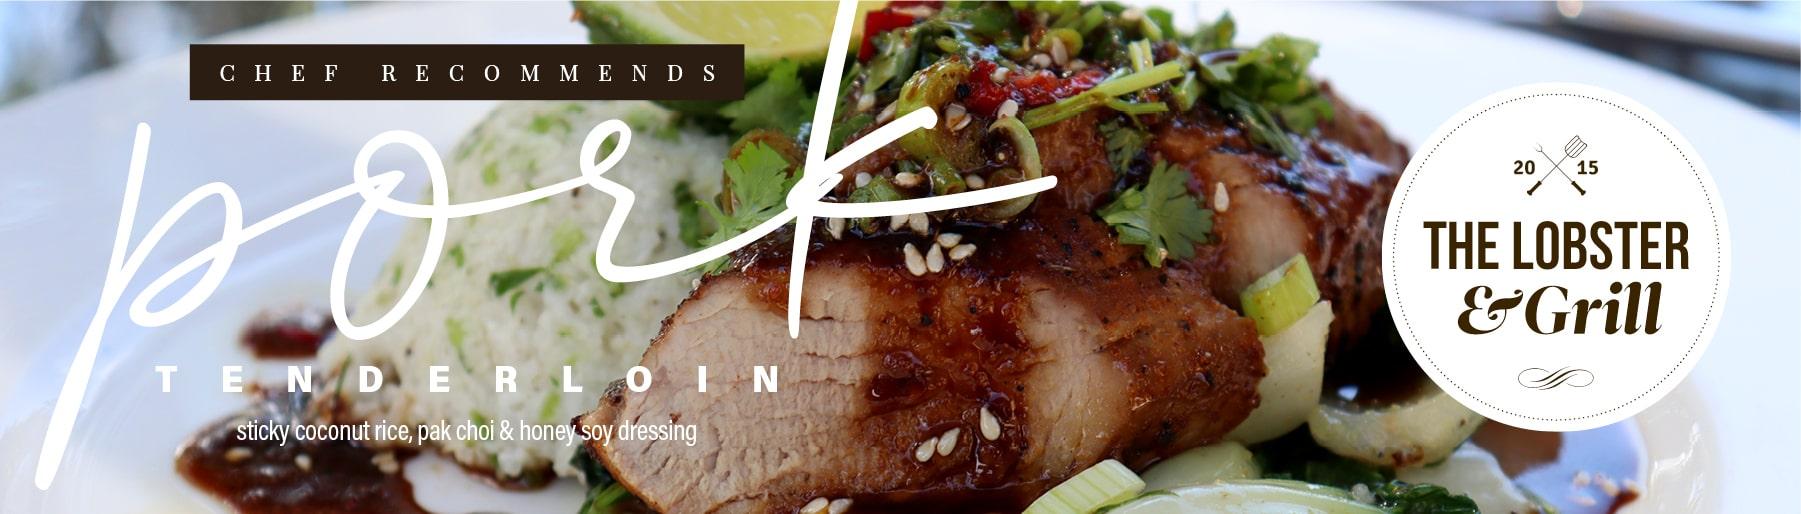 Chef Recommends Pork Tenderloin